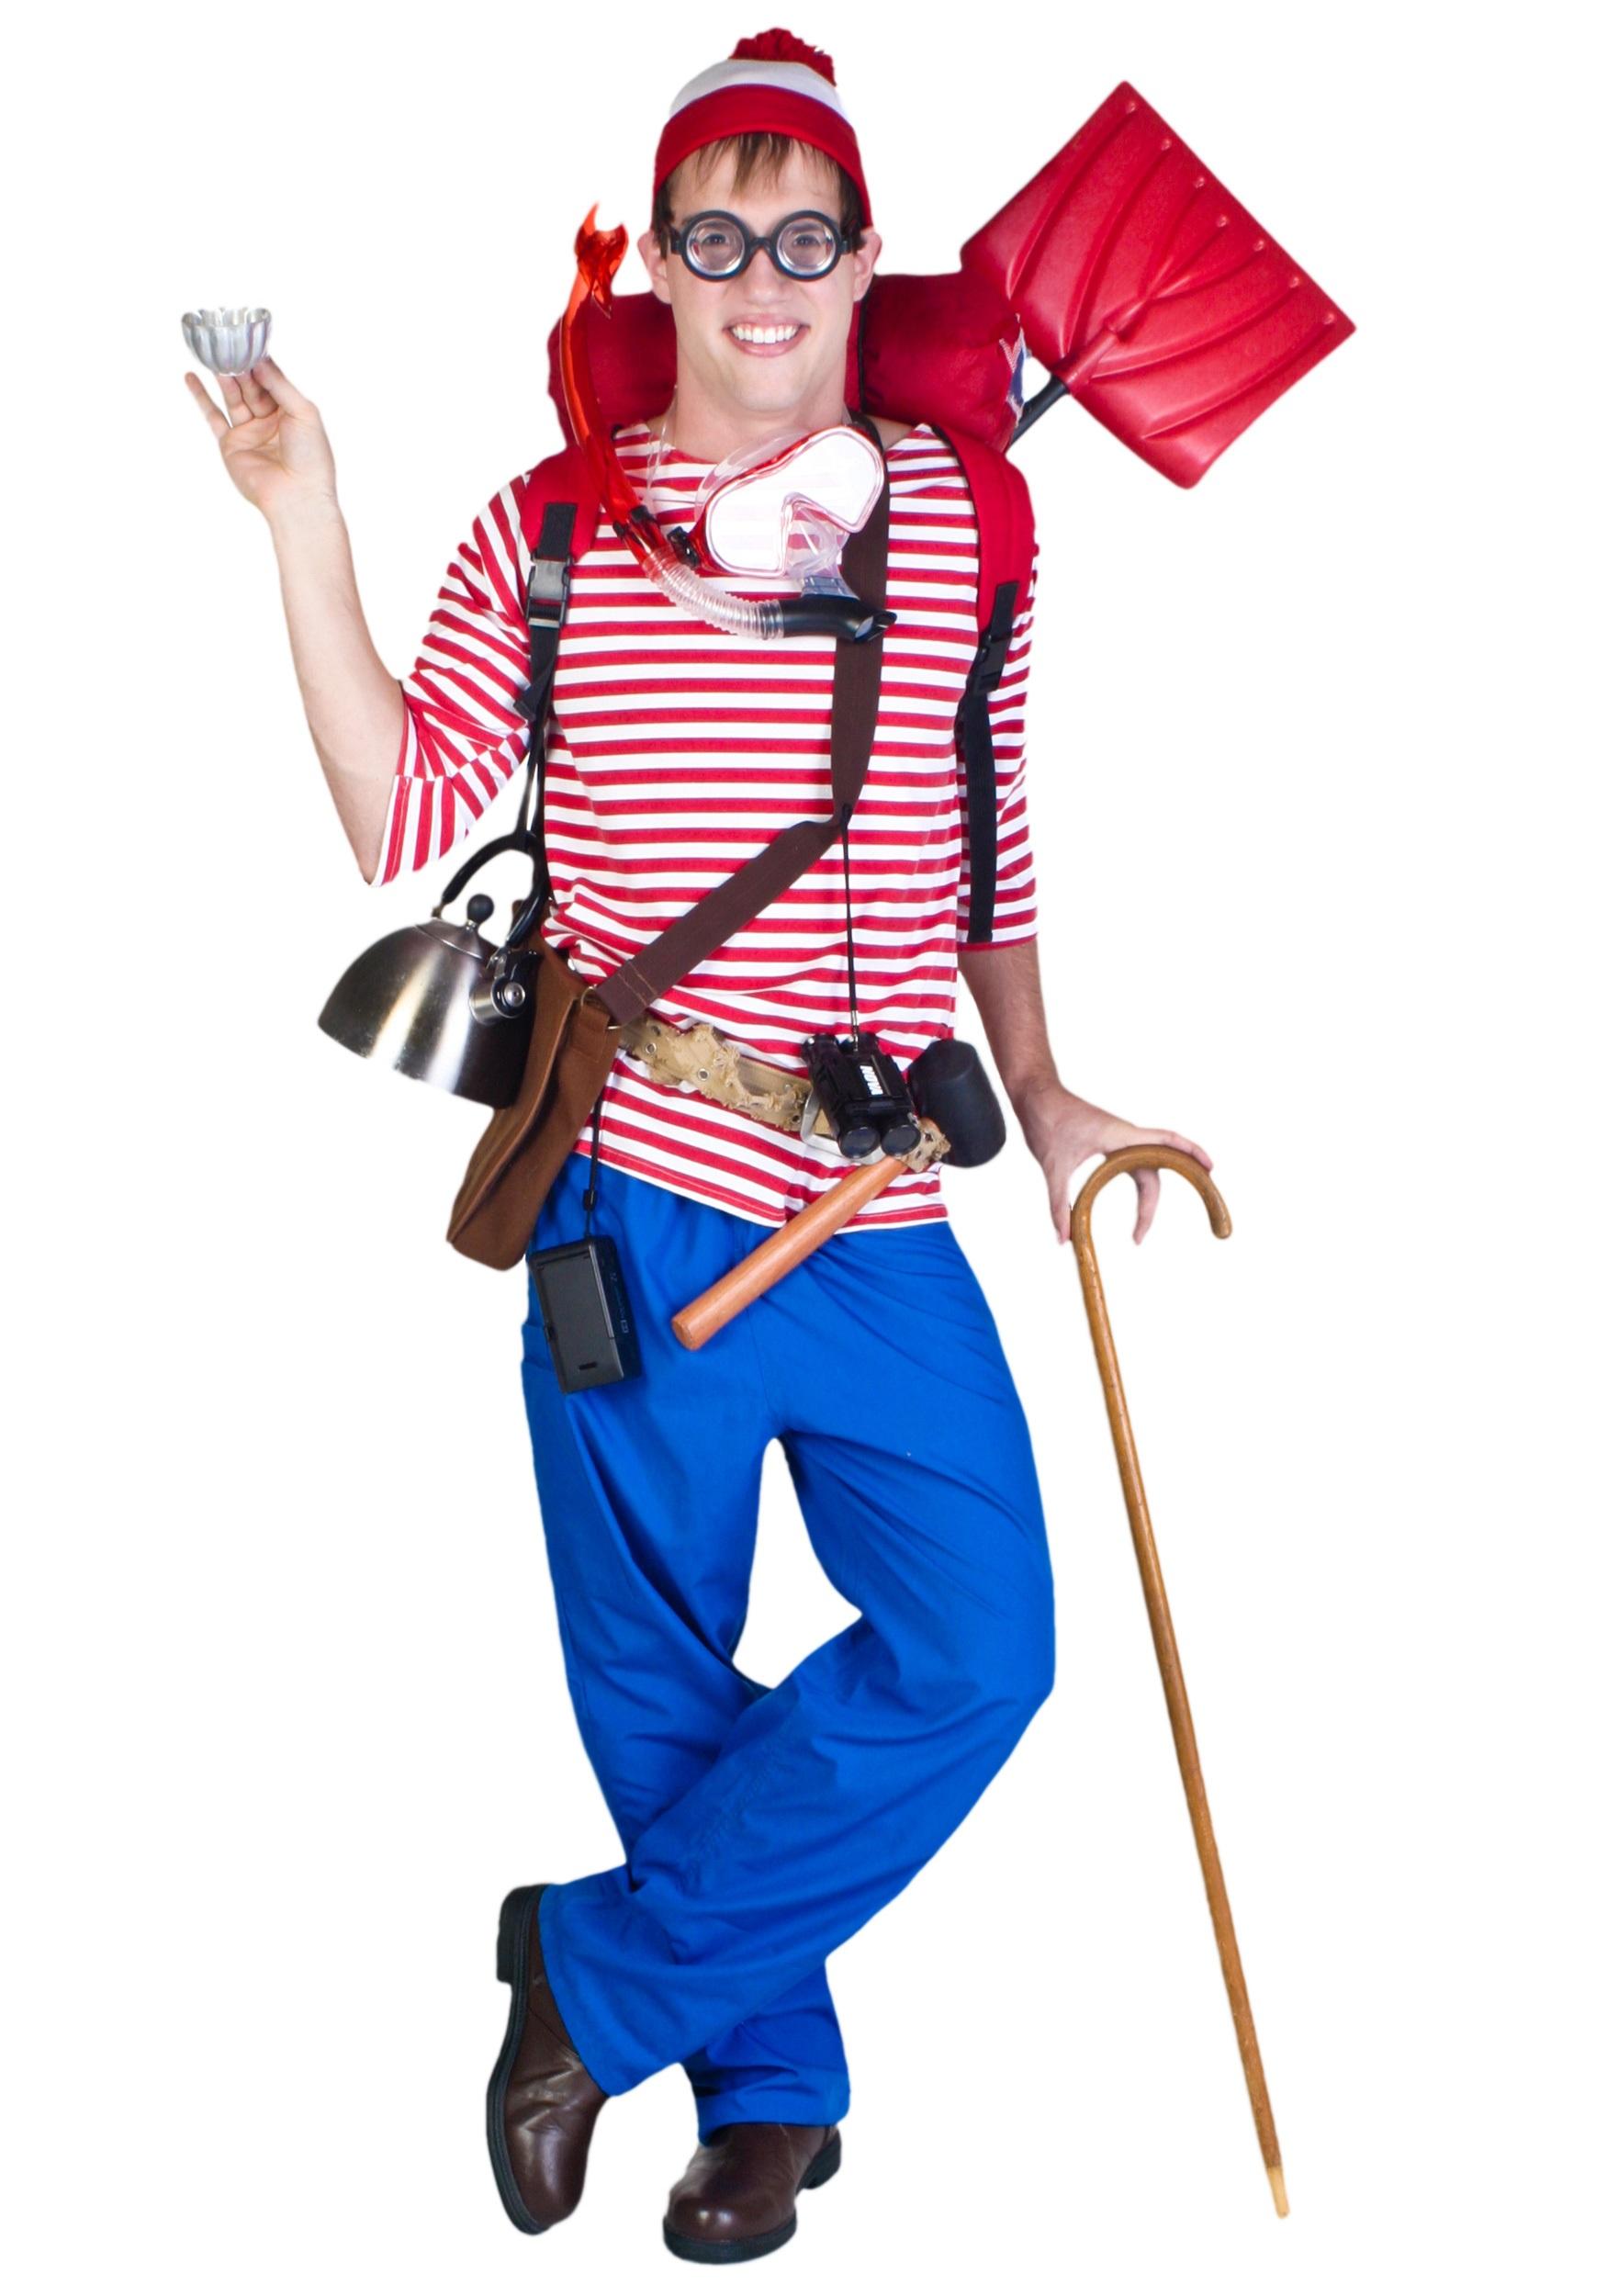 Adventure Whereu0027s Waldo Costume  sc 1 st  Costumes Galore & Halloween Costumes - Classic Halloween Costume Ideas